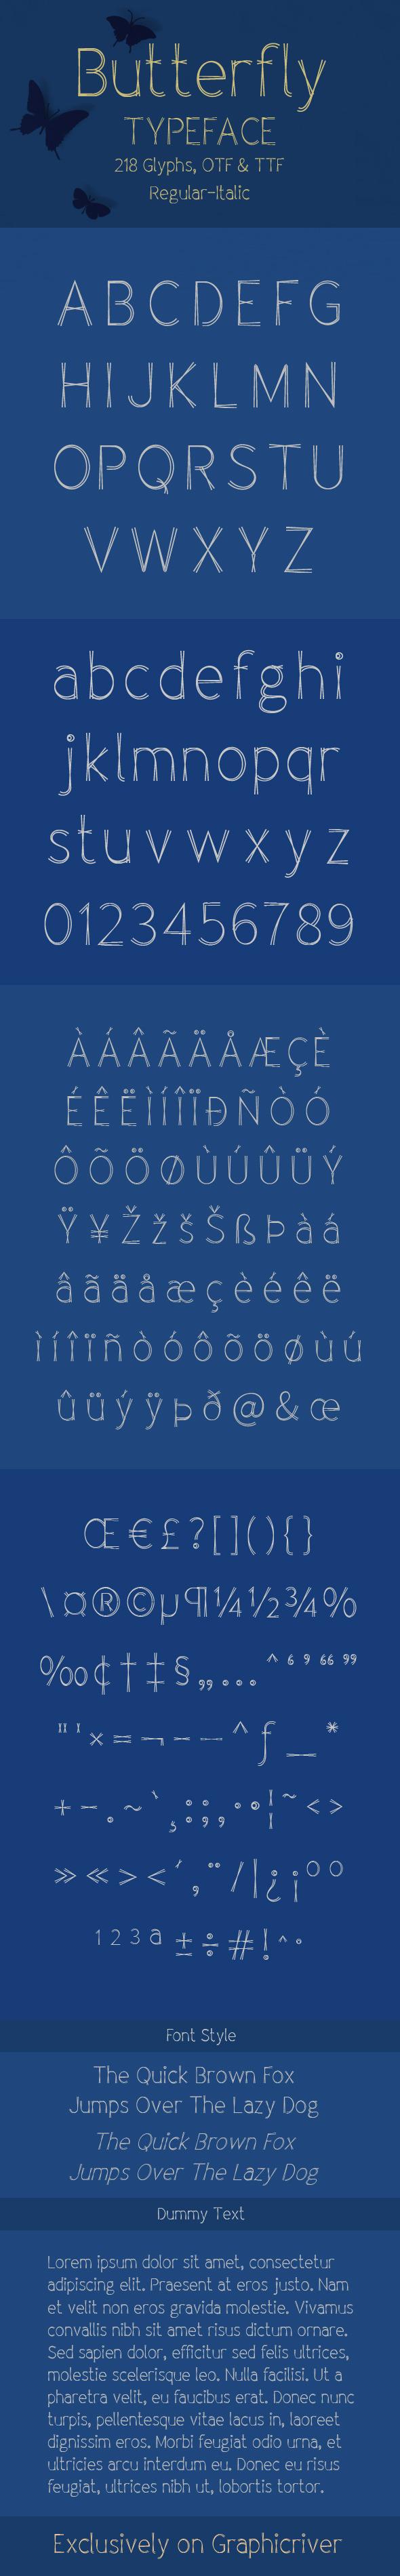 Butterfly Typeface - Sans-Serif Fonts